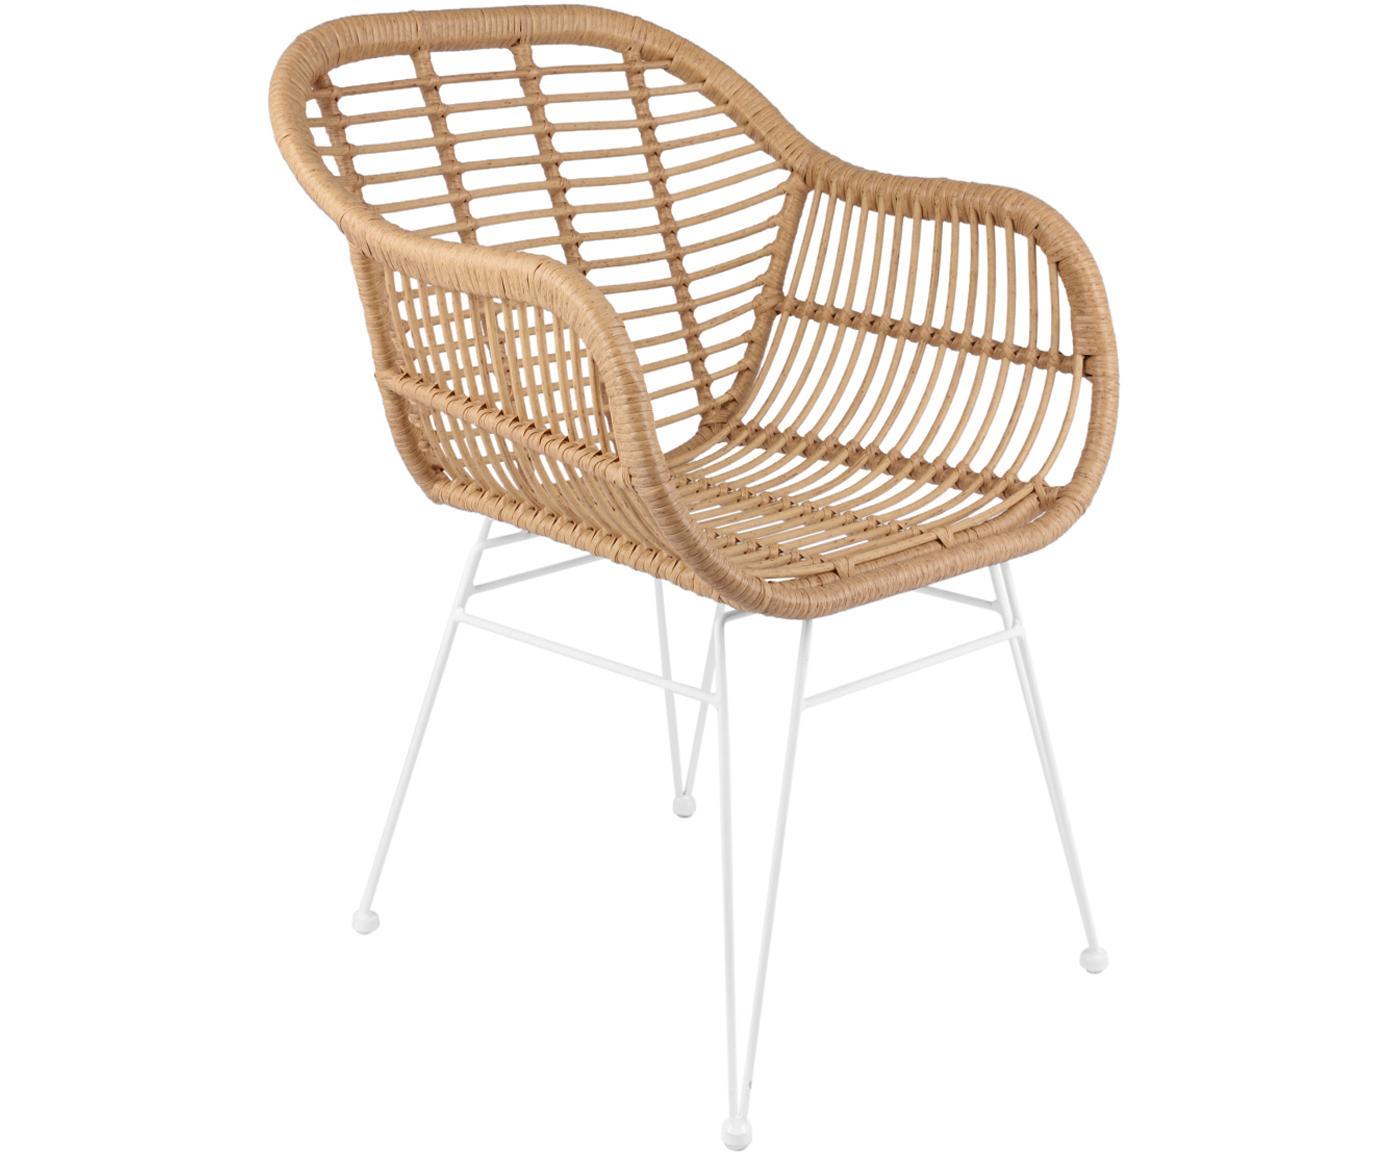 Polyrattan-Armlehnstühle Costa, 2 Stück, Sitzfläche: Polyethylen-Geflecht, Gestell: Metall, pulverbeschichtet, Hellbraun, Beine Weiss, B 60 x T 58 cm